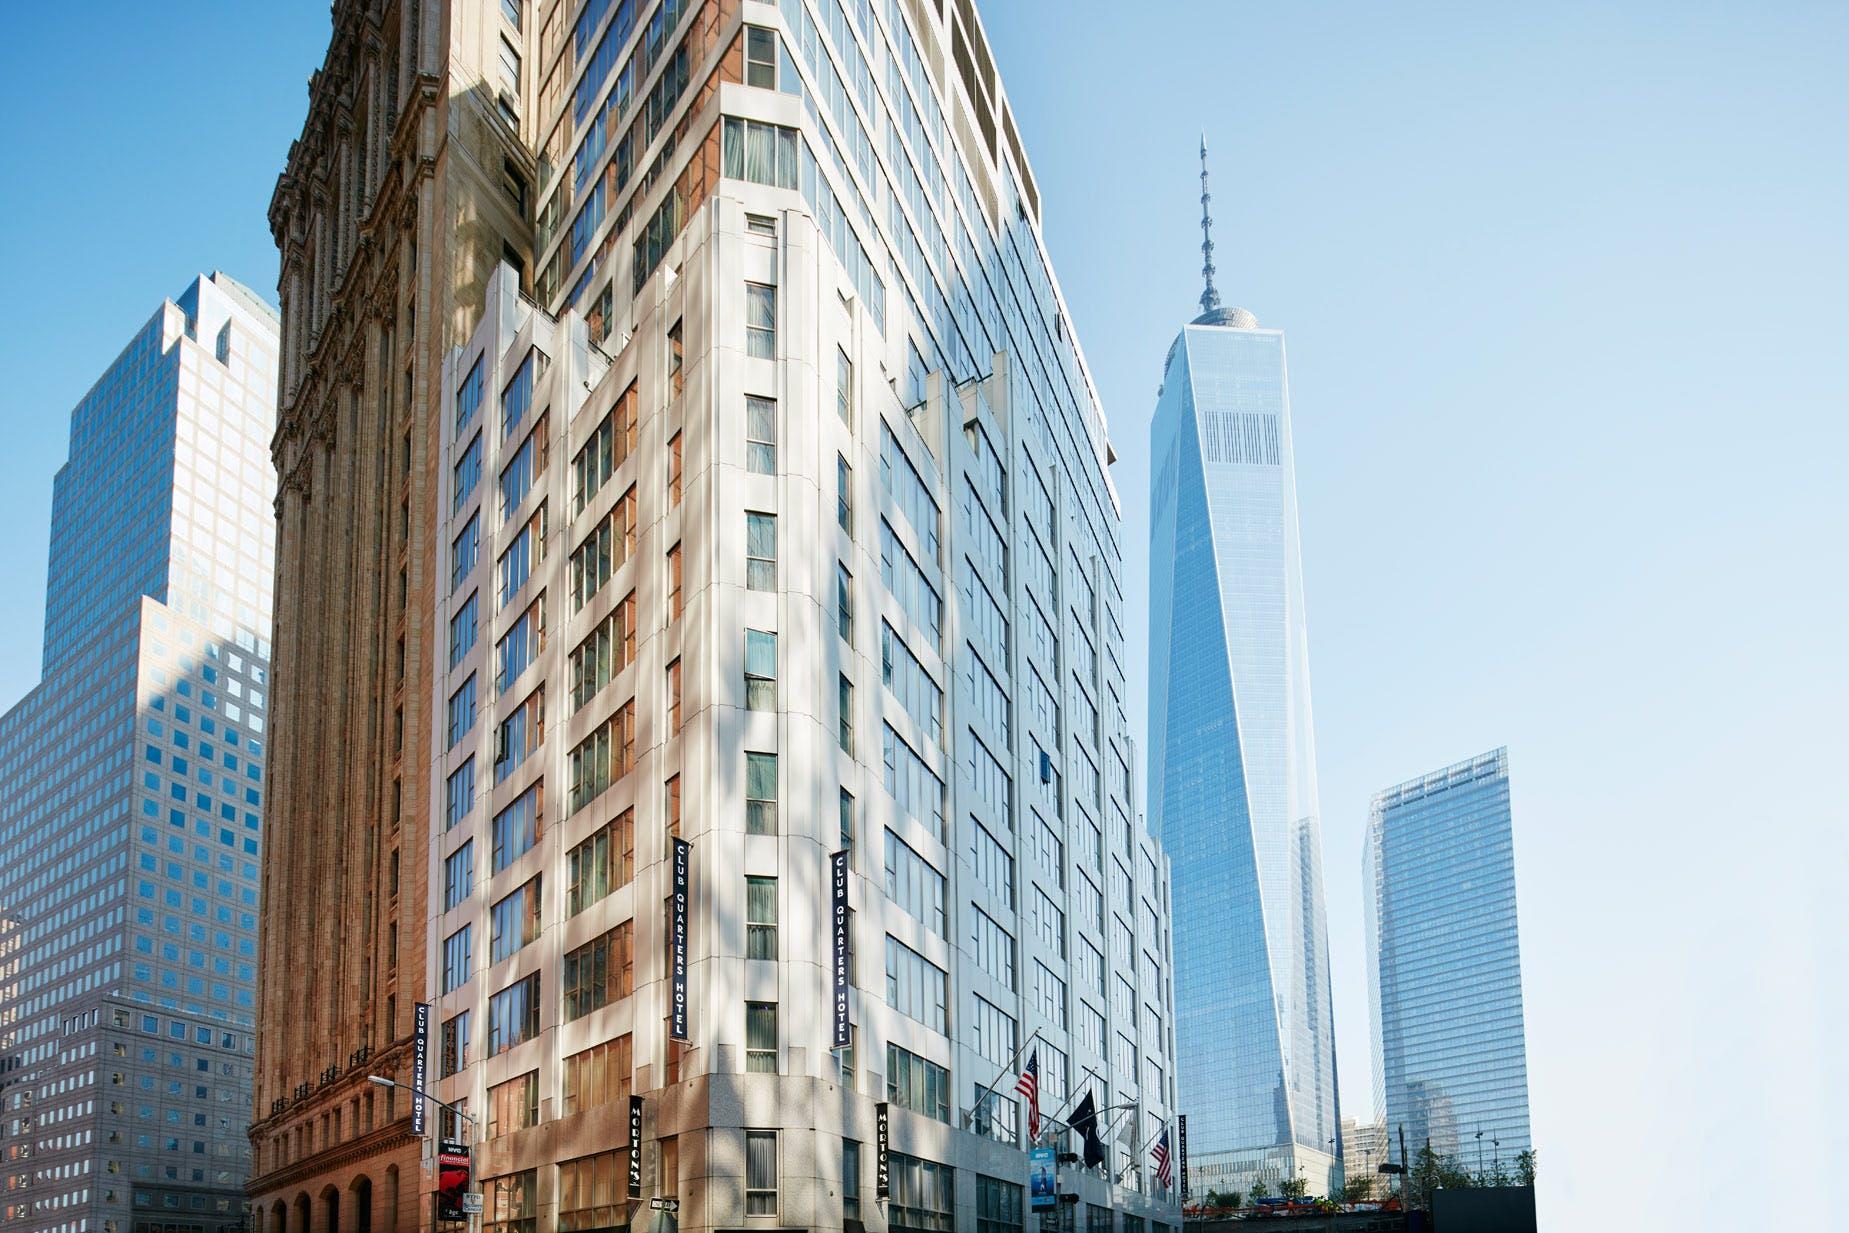 Club Quarters Hotel, World Trade Center, steps from One World Trade Center, Lower Manhattan, NYC